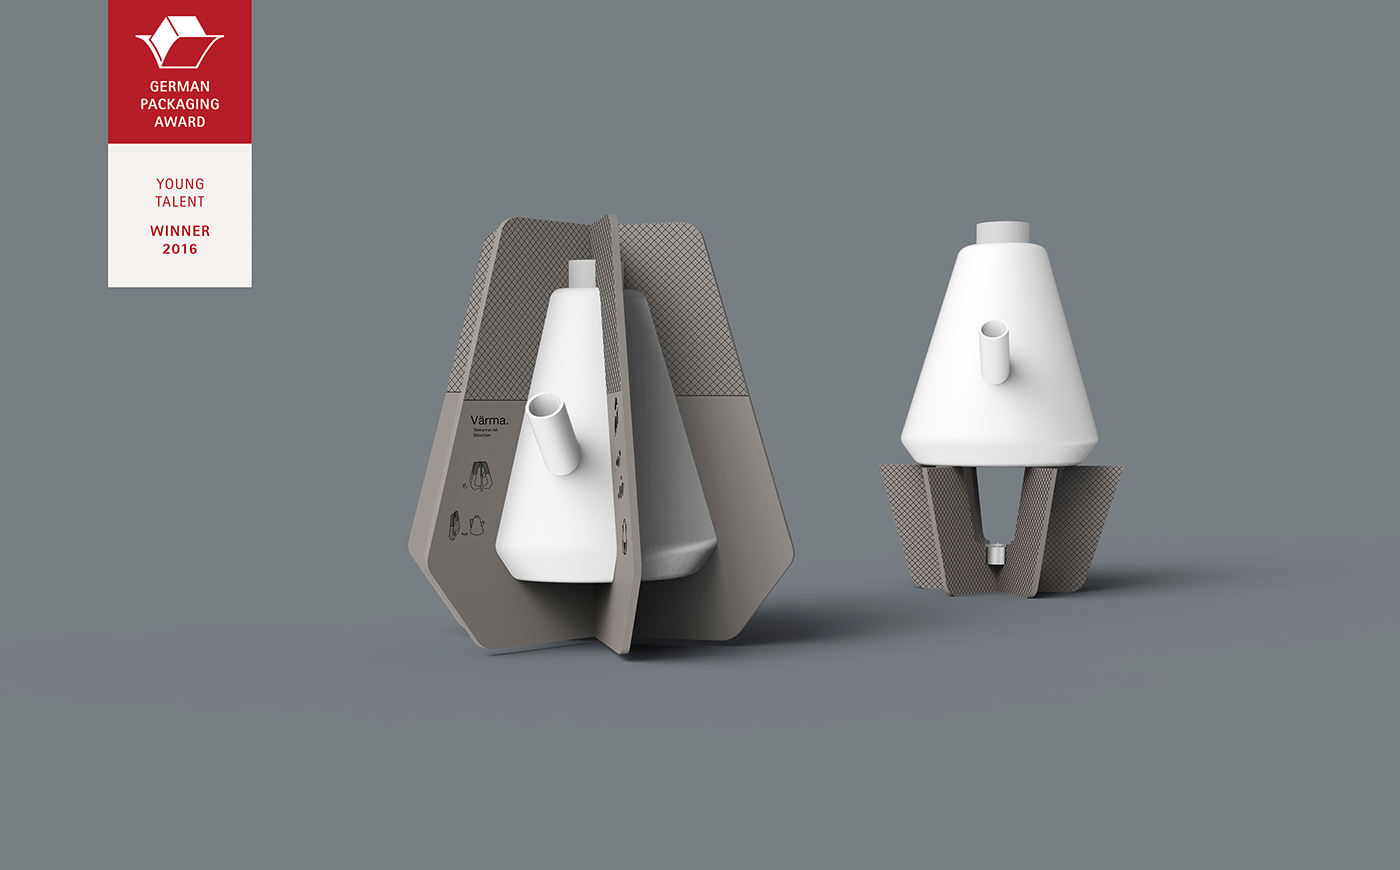 Packaging two benefits industrial design  Multi-purpose minimalistic protection presentation tea warmer